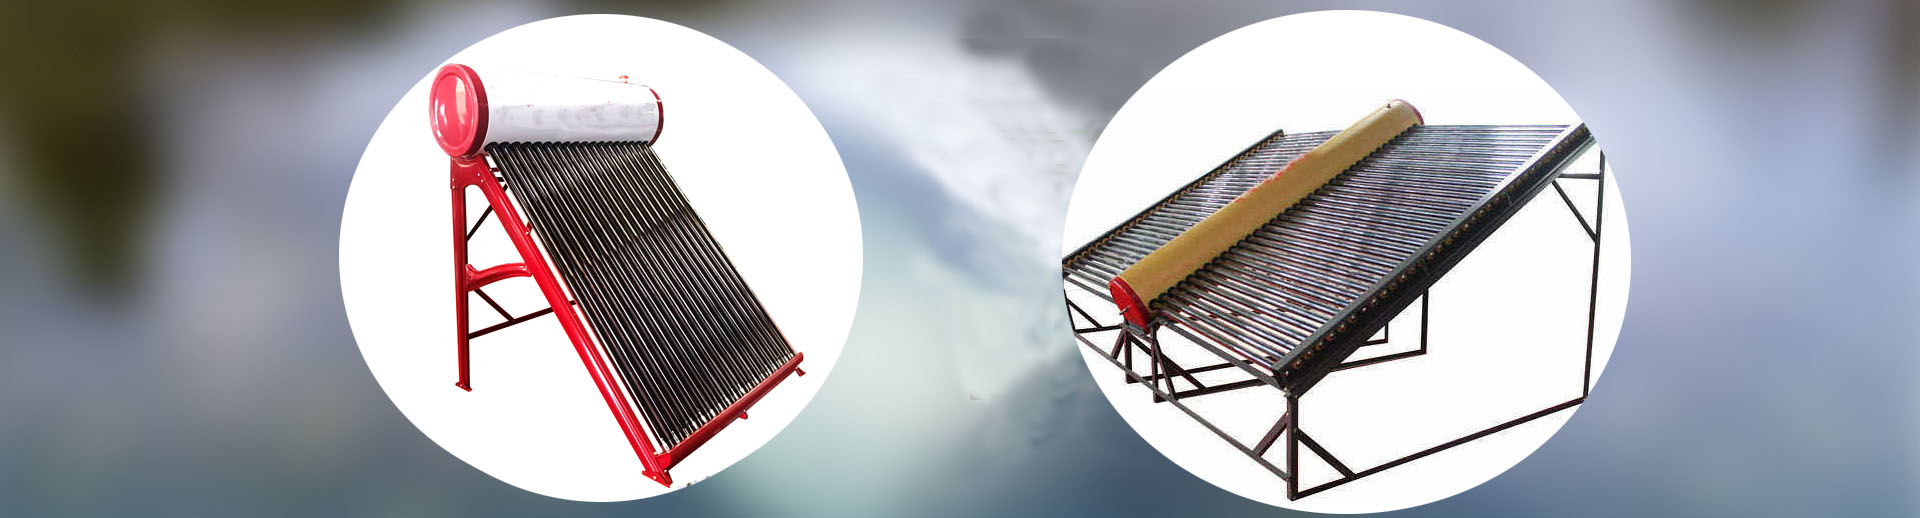 china-solar-water-heaters